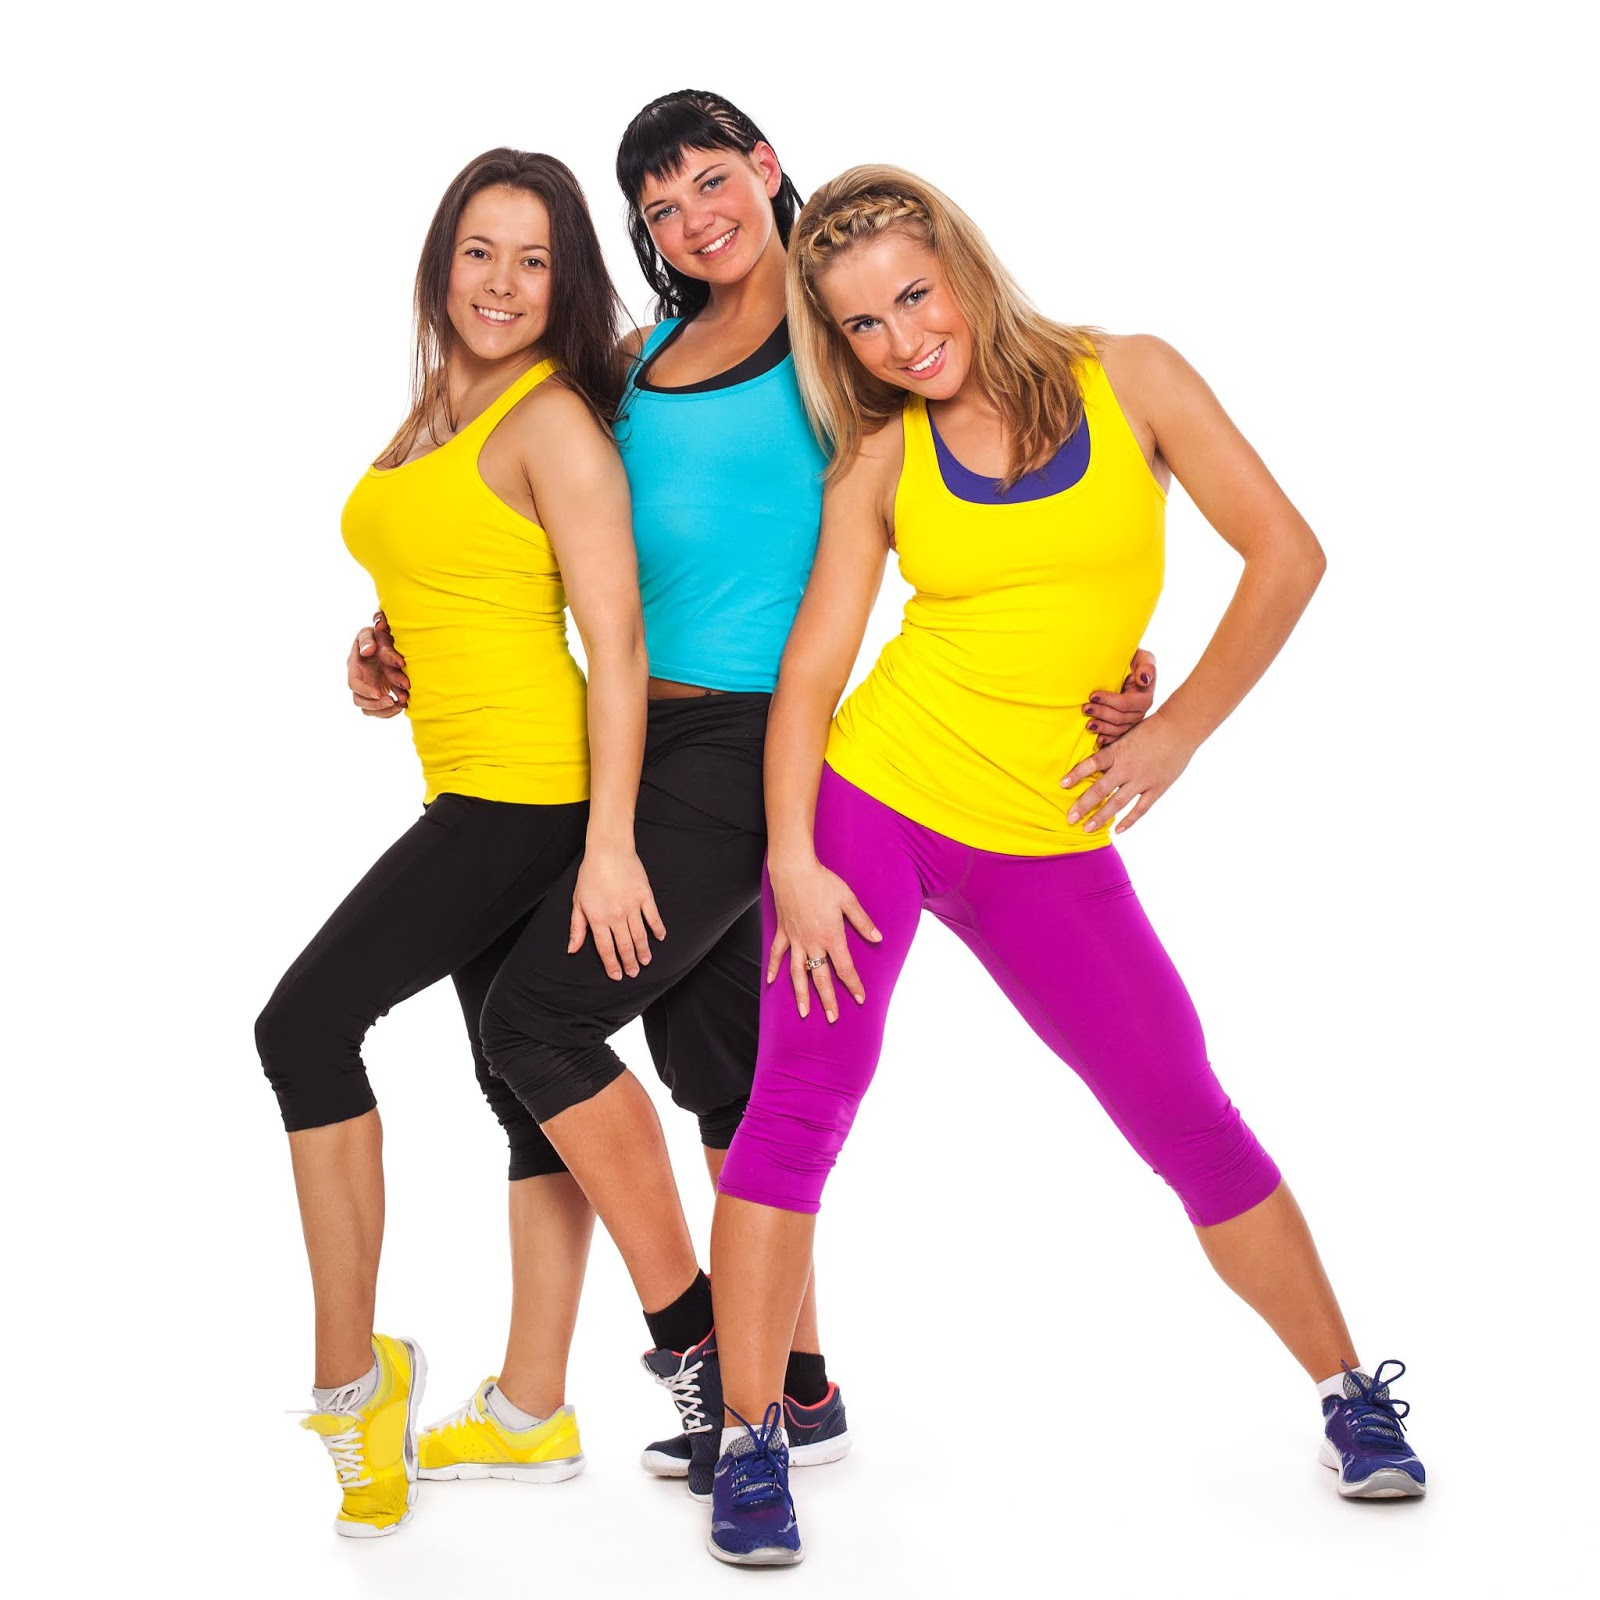 697 - Benefícios da Zumba Fitness